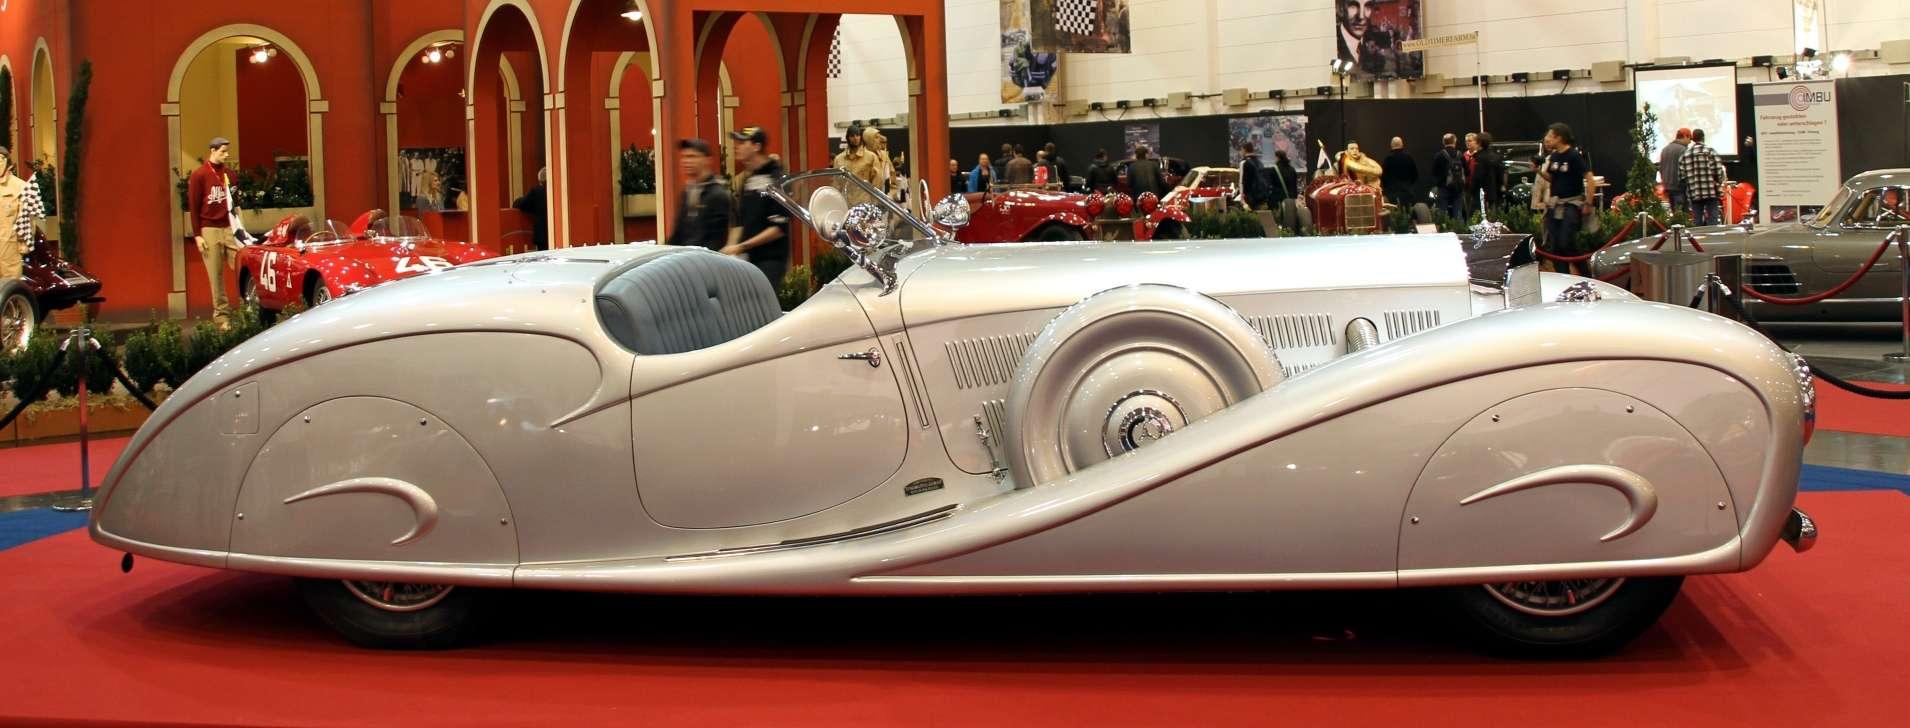 Power Cars Mercedes Benz 500 K By Erdmann Amp Rossi